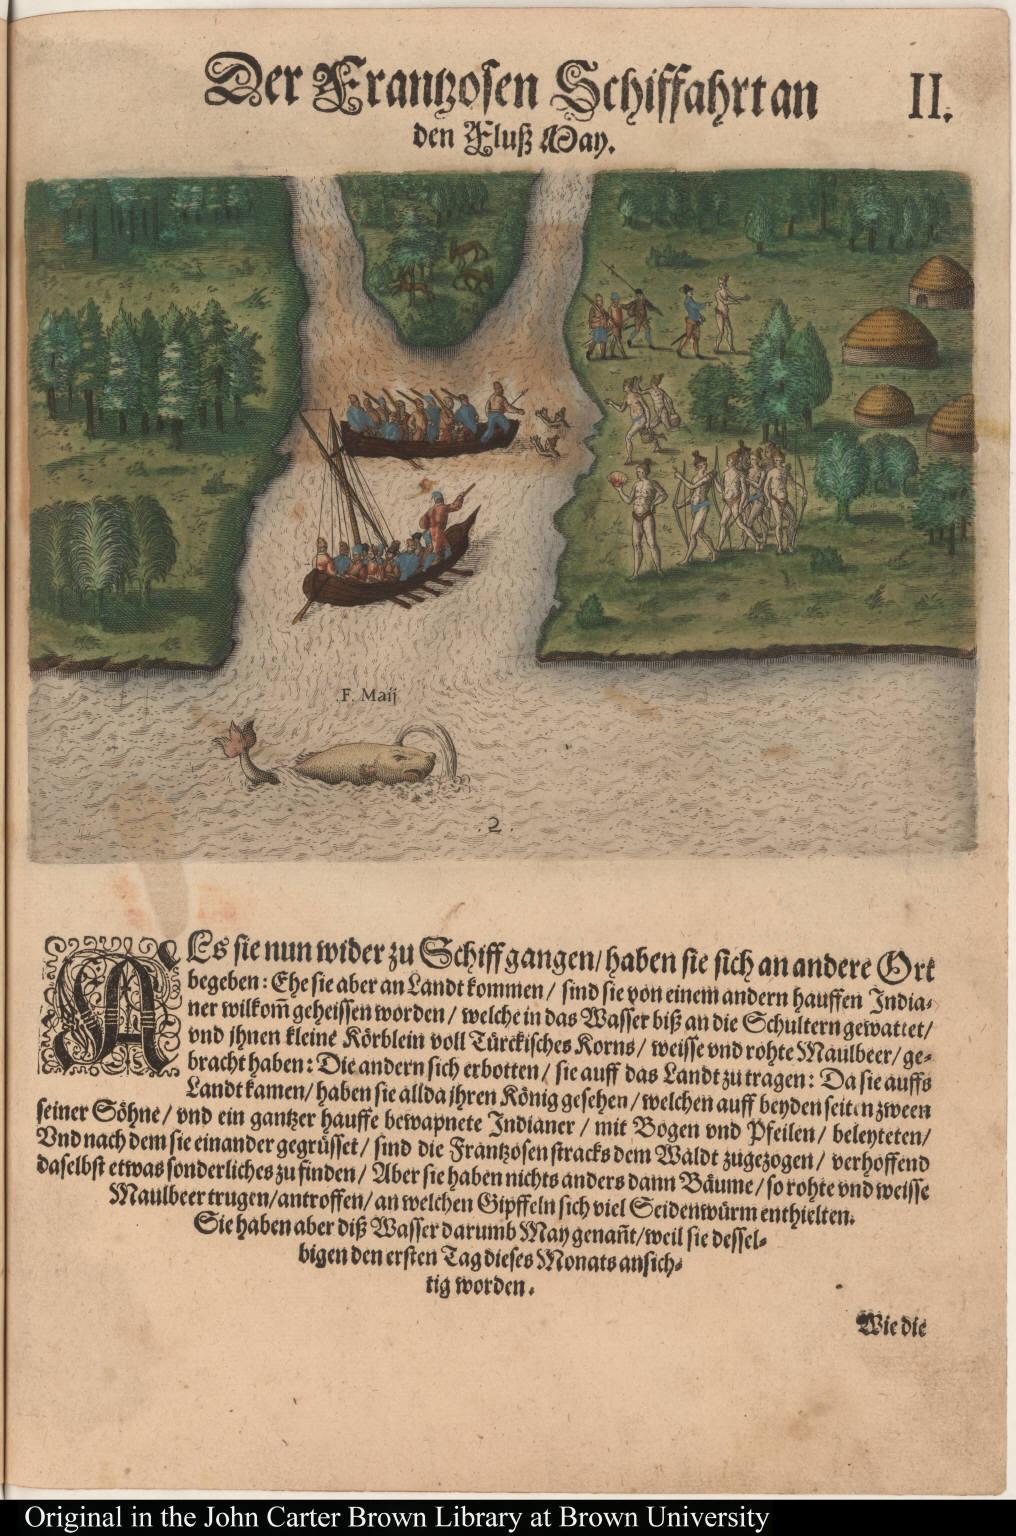 Der Franzosen Schiffahrtan den Fluss May.